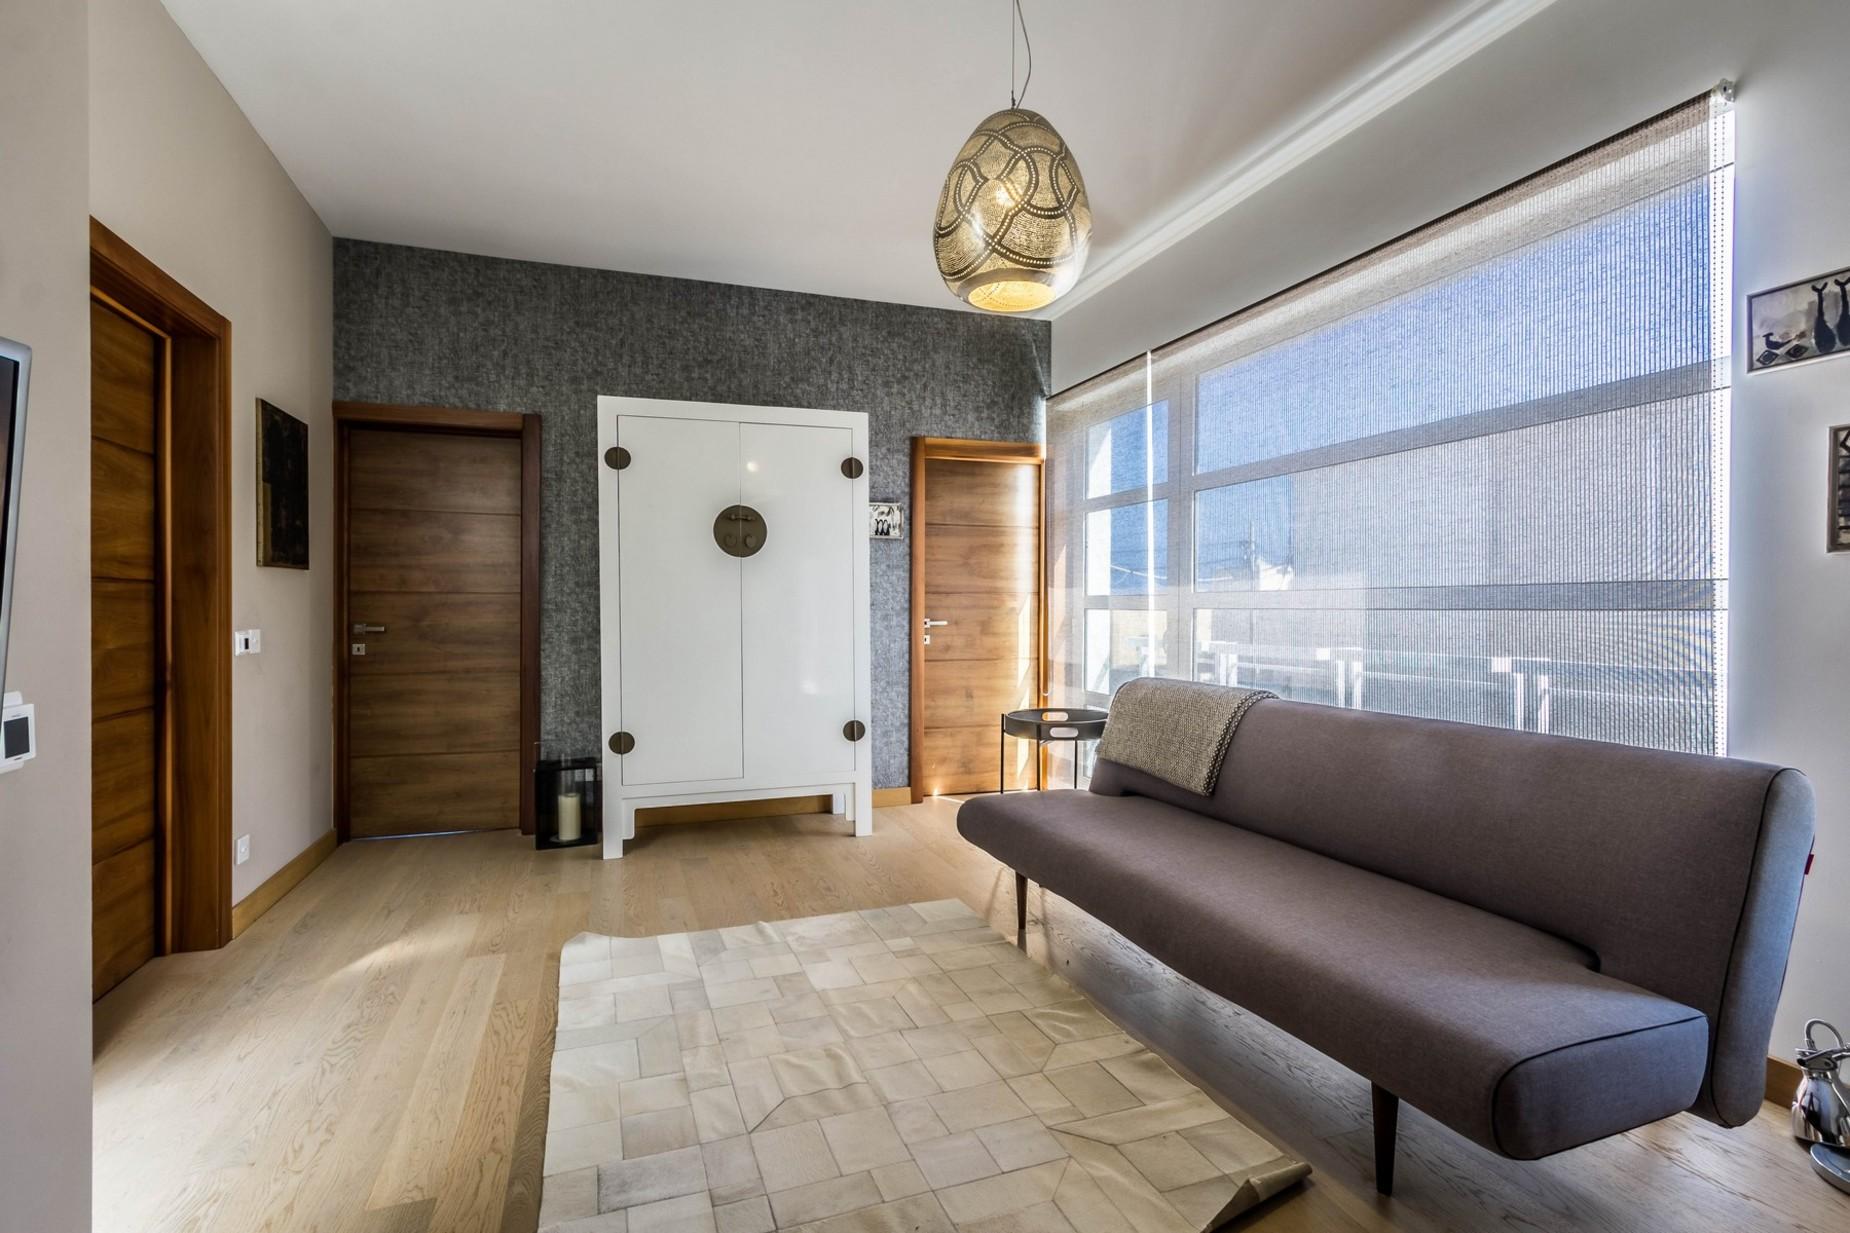 3 bed Villa For Sale in San Gwann, San Gwann - thumb 8